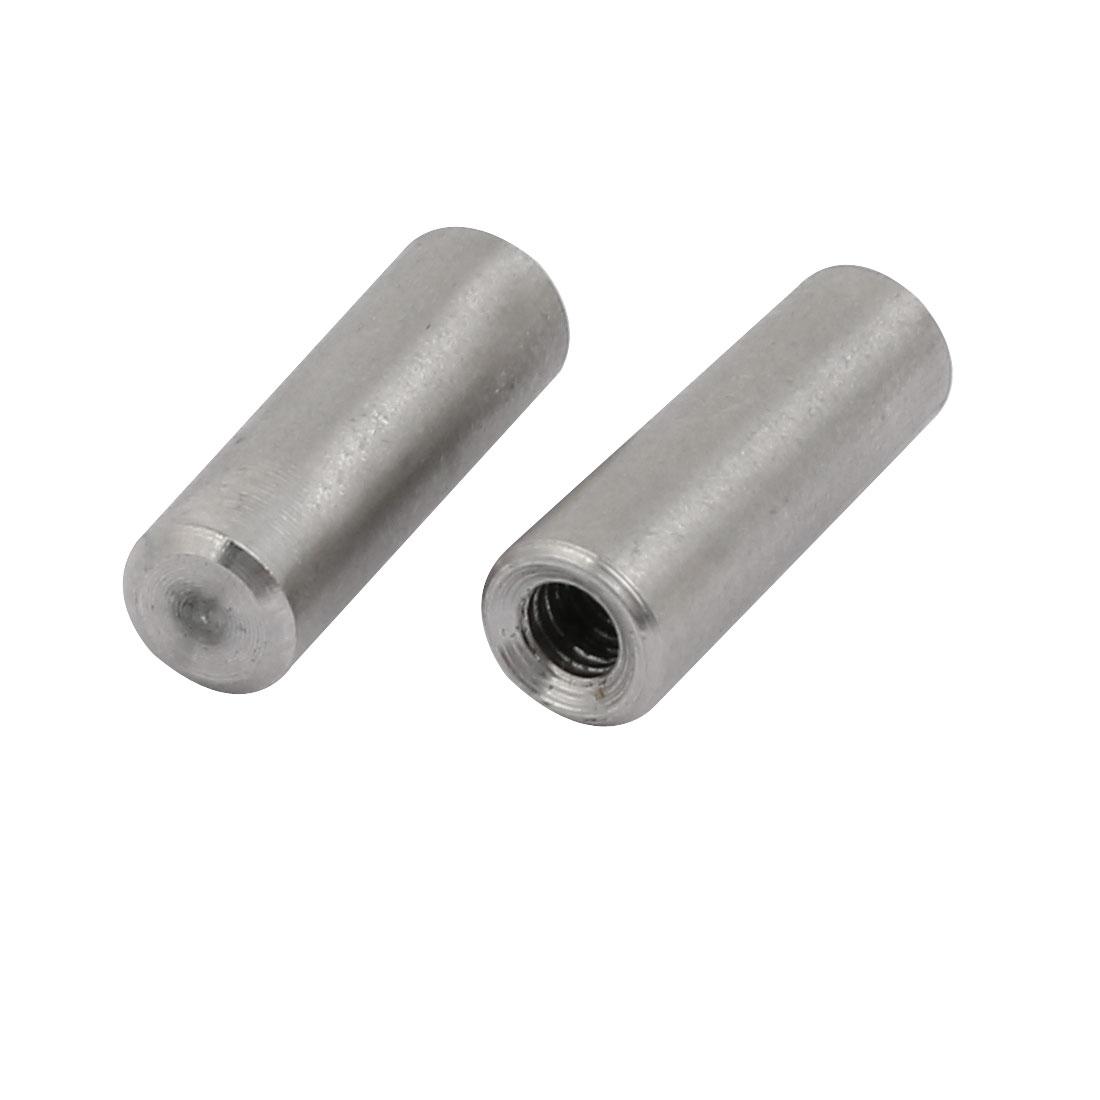 Unique Bargains 2 Pcs GB118 Stainless Steel 5mm Diameter 16mm Length Taper Pin w Internal Thread - image 1 de 1